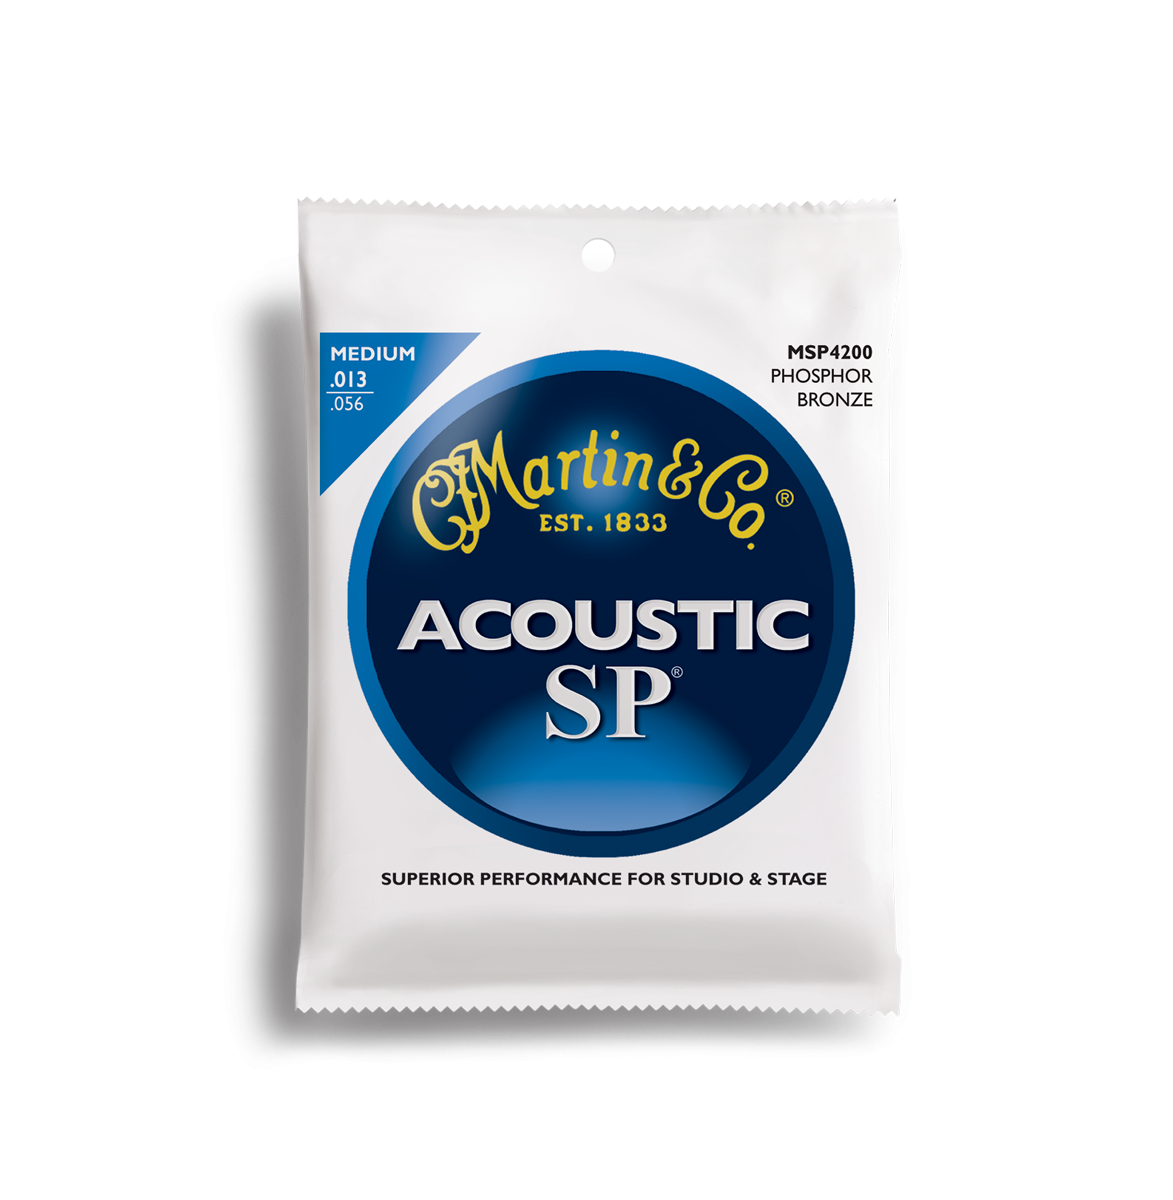 Martin SP Phosphor Bronze MSP4200 Acoustic Guitar Strings, Medium, 13-56